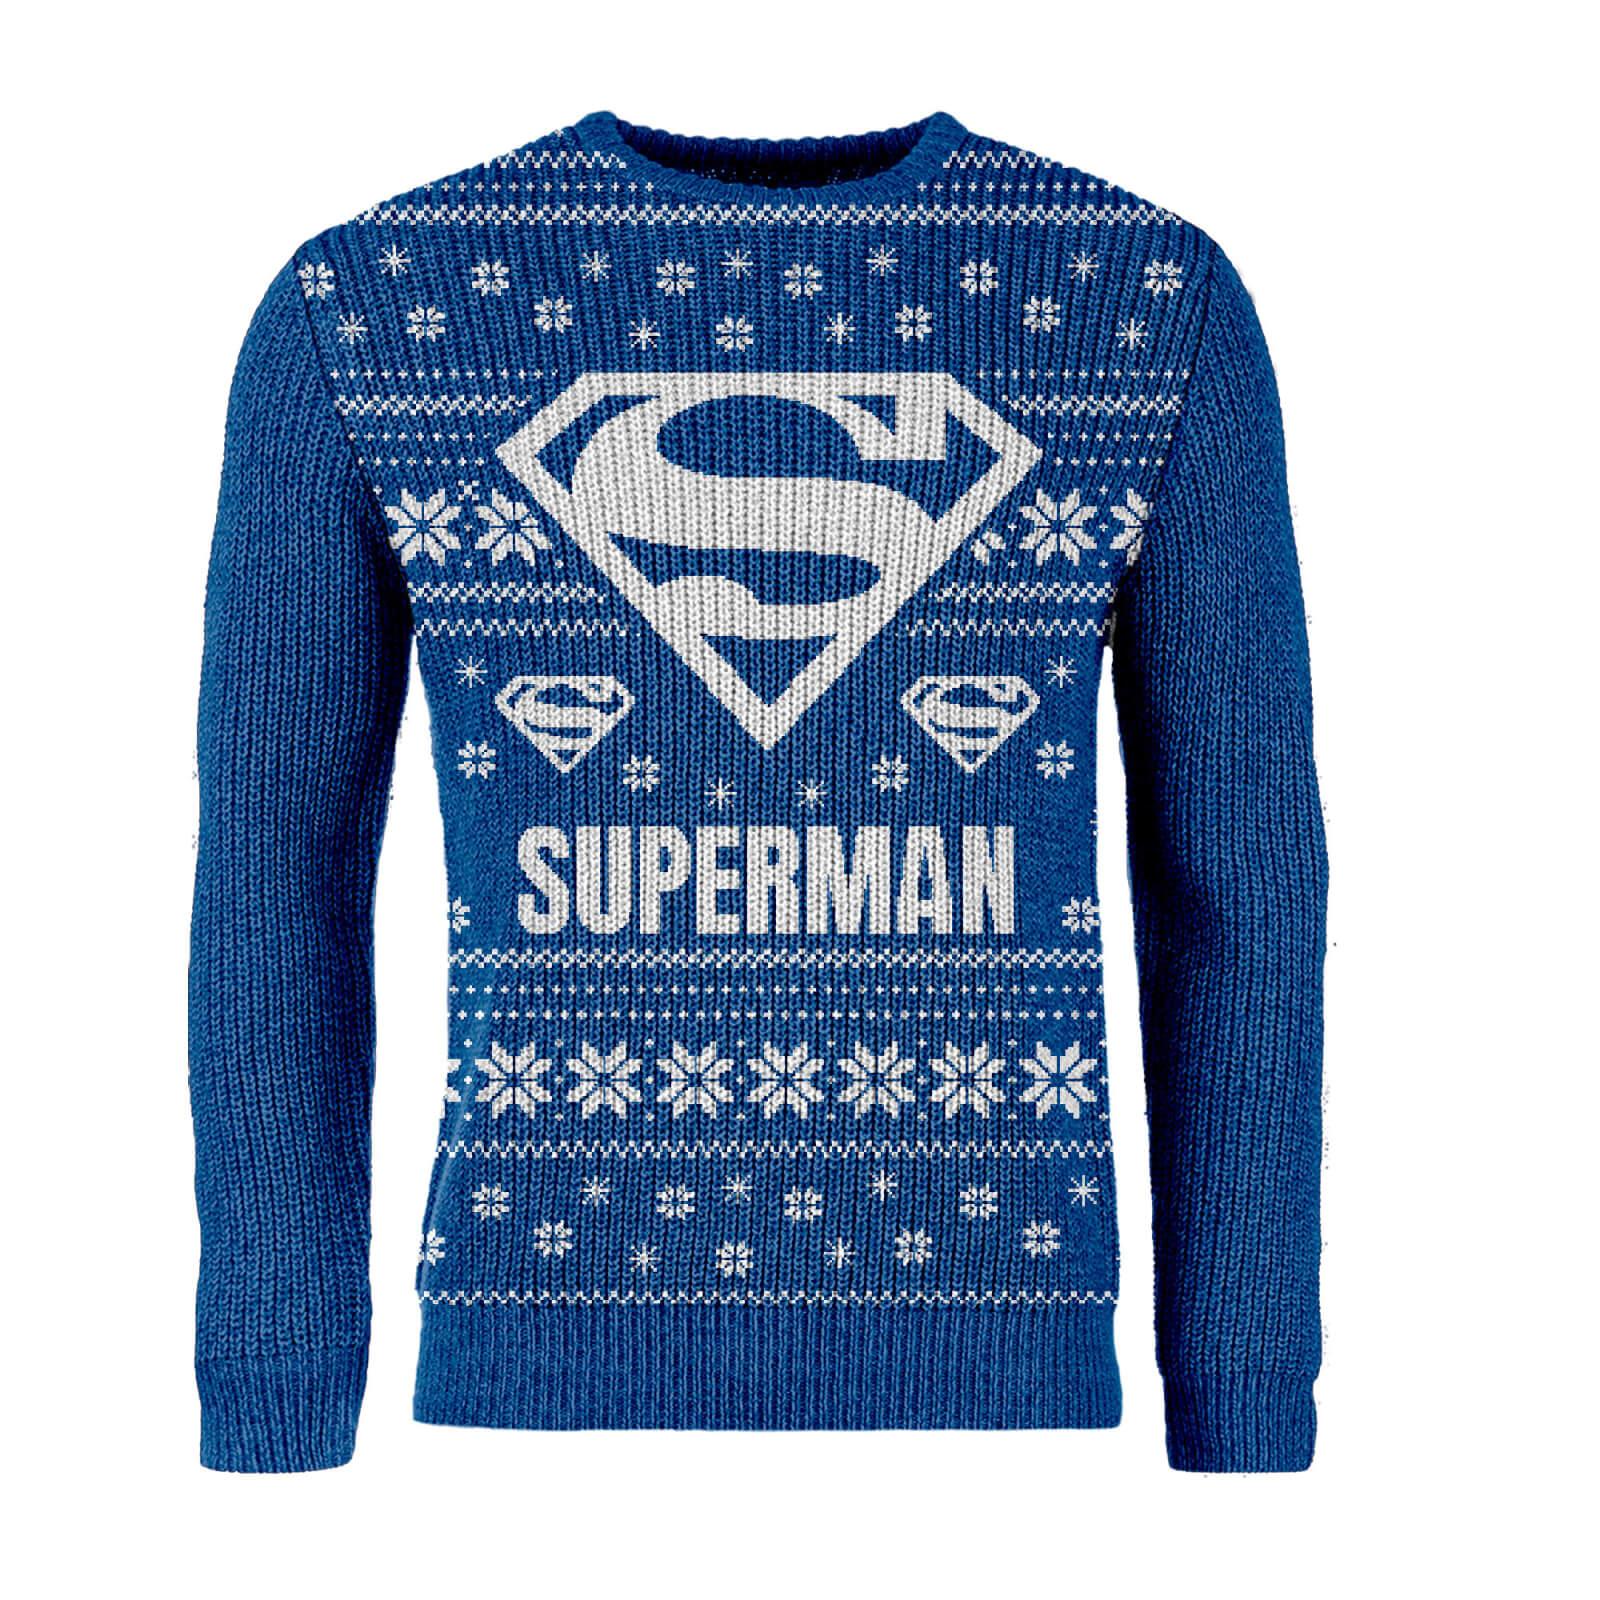 Gebreide Kersttrui.Zavvi Exclusive Superman Gebreide Kersttrui Blauw Zavvi Nl